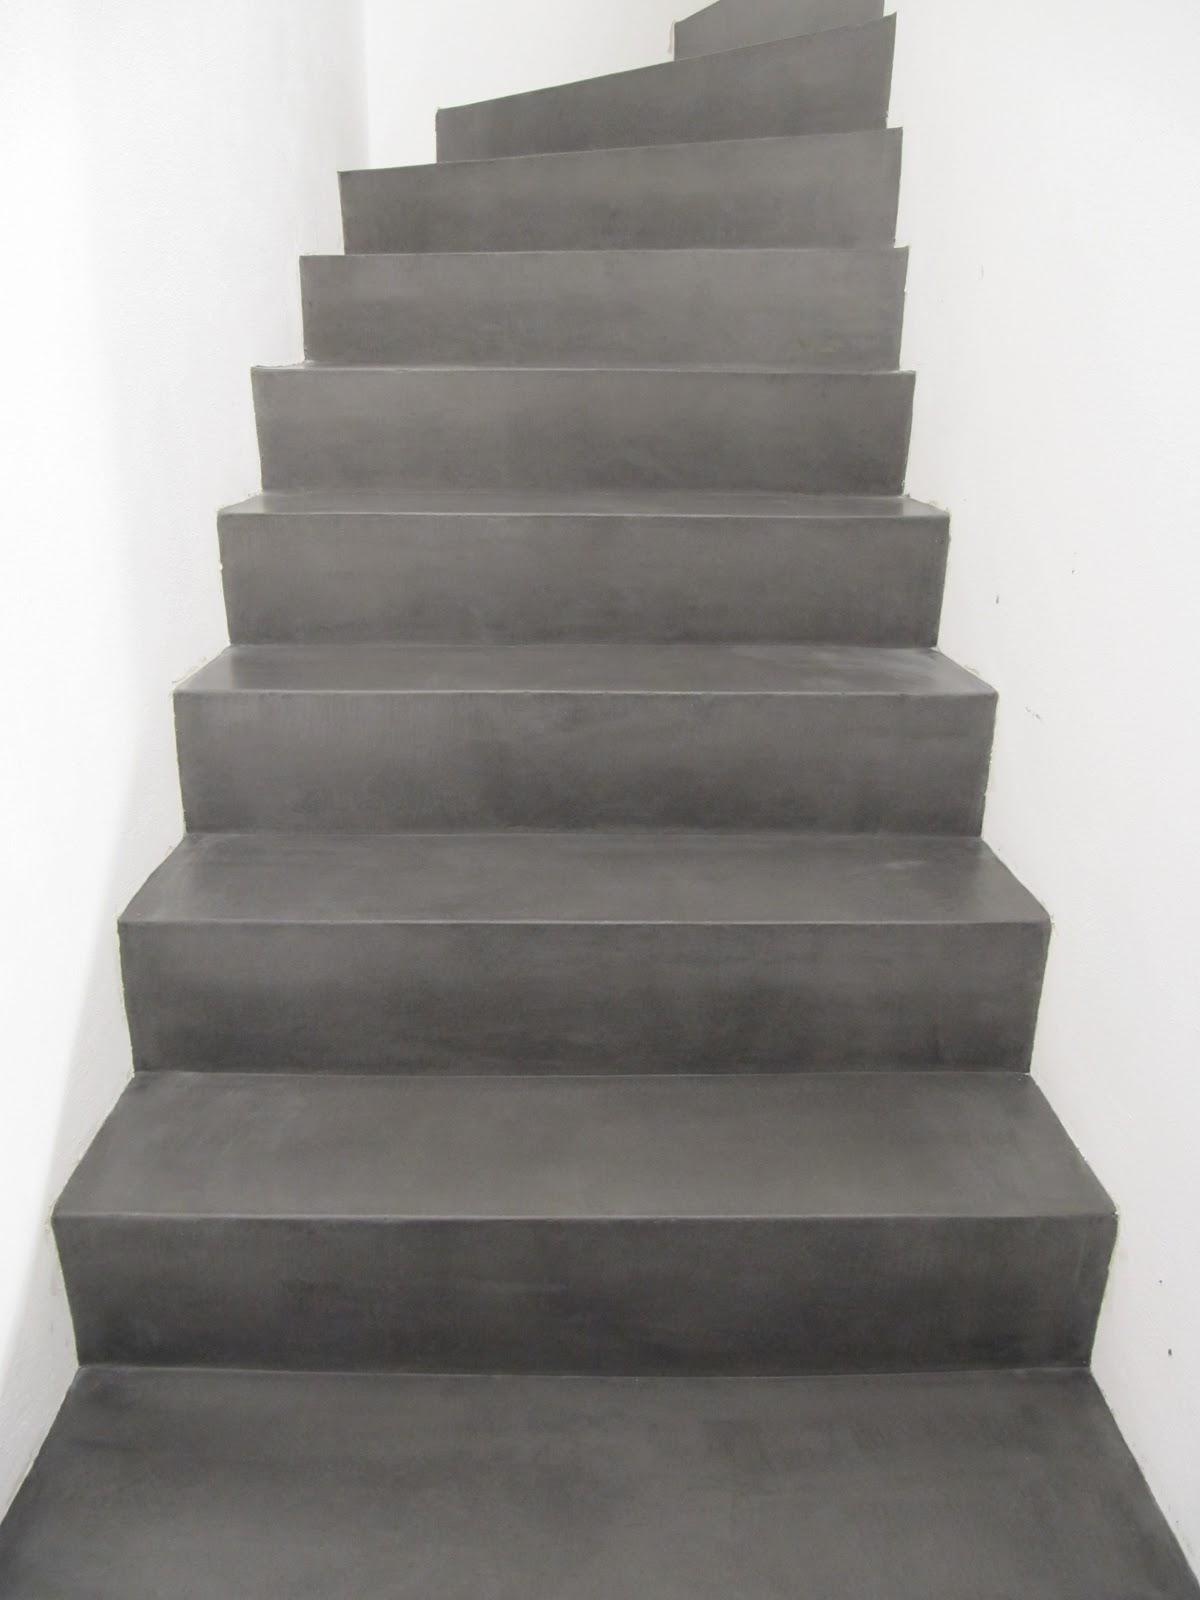 Beton unique beton cire betontreppe - Beton cire millimetrique ...